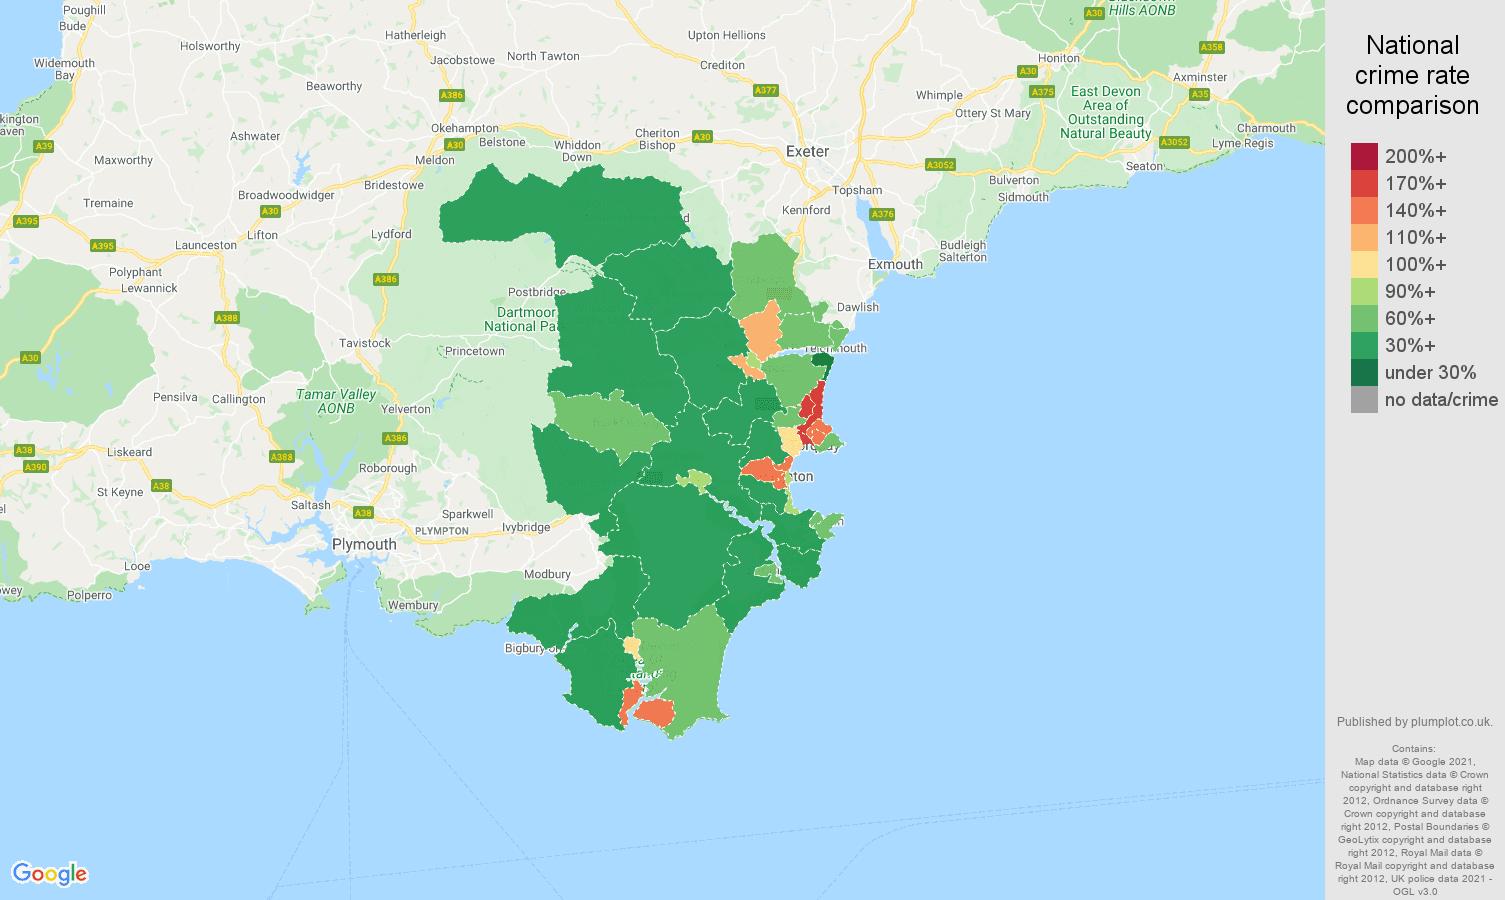 Torquay criminal damage and arson crime rate comparison map